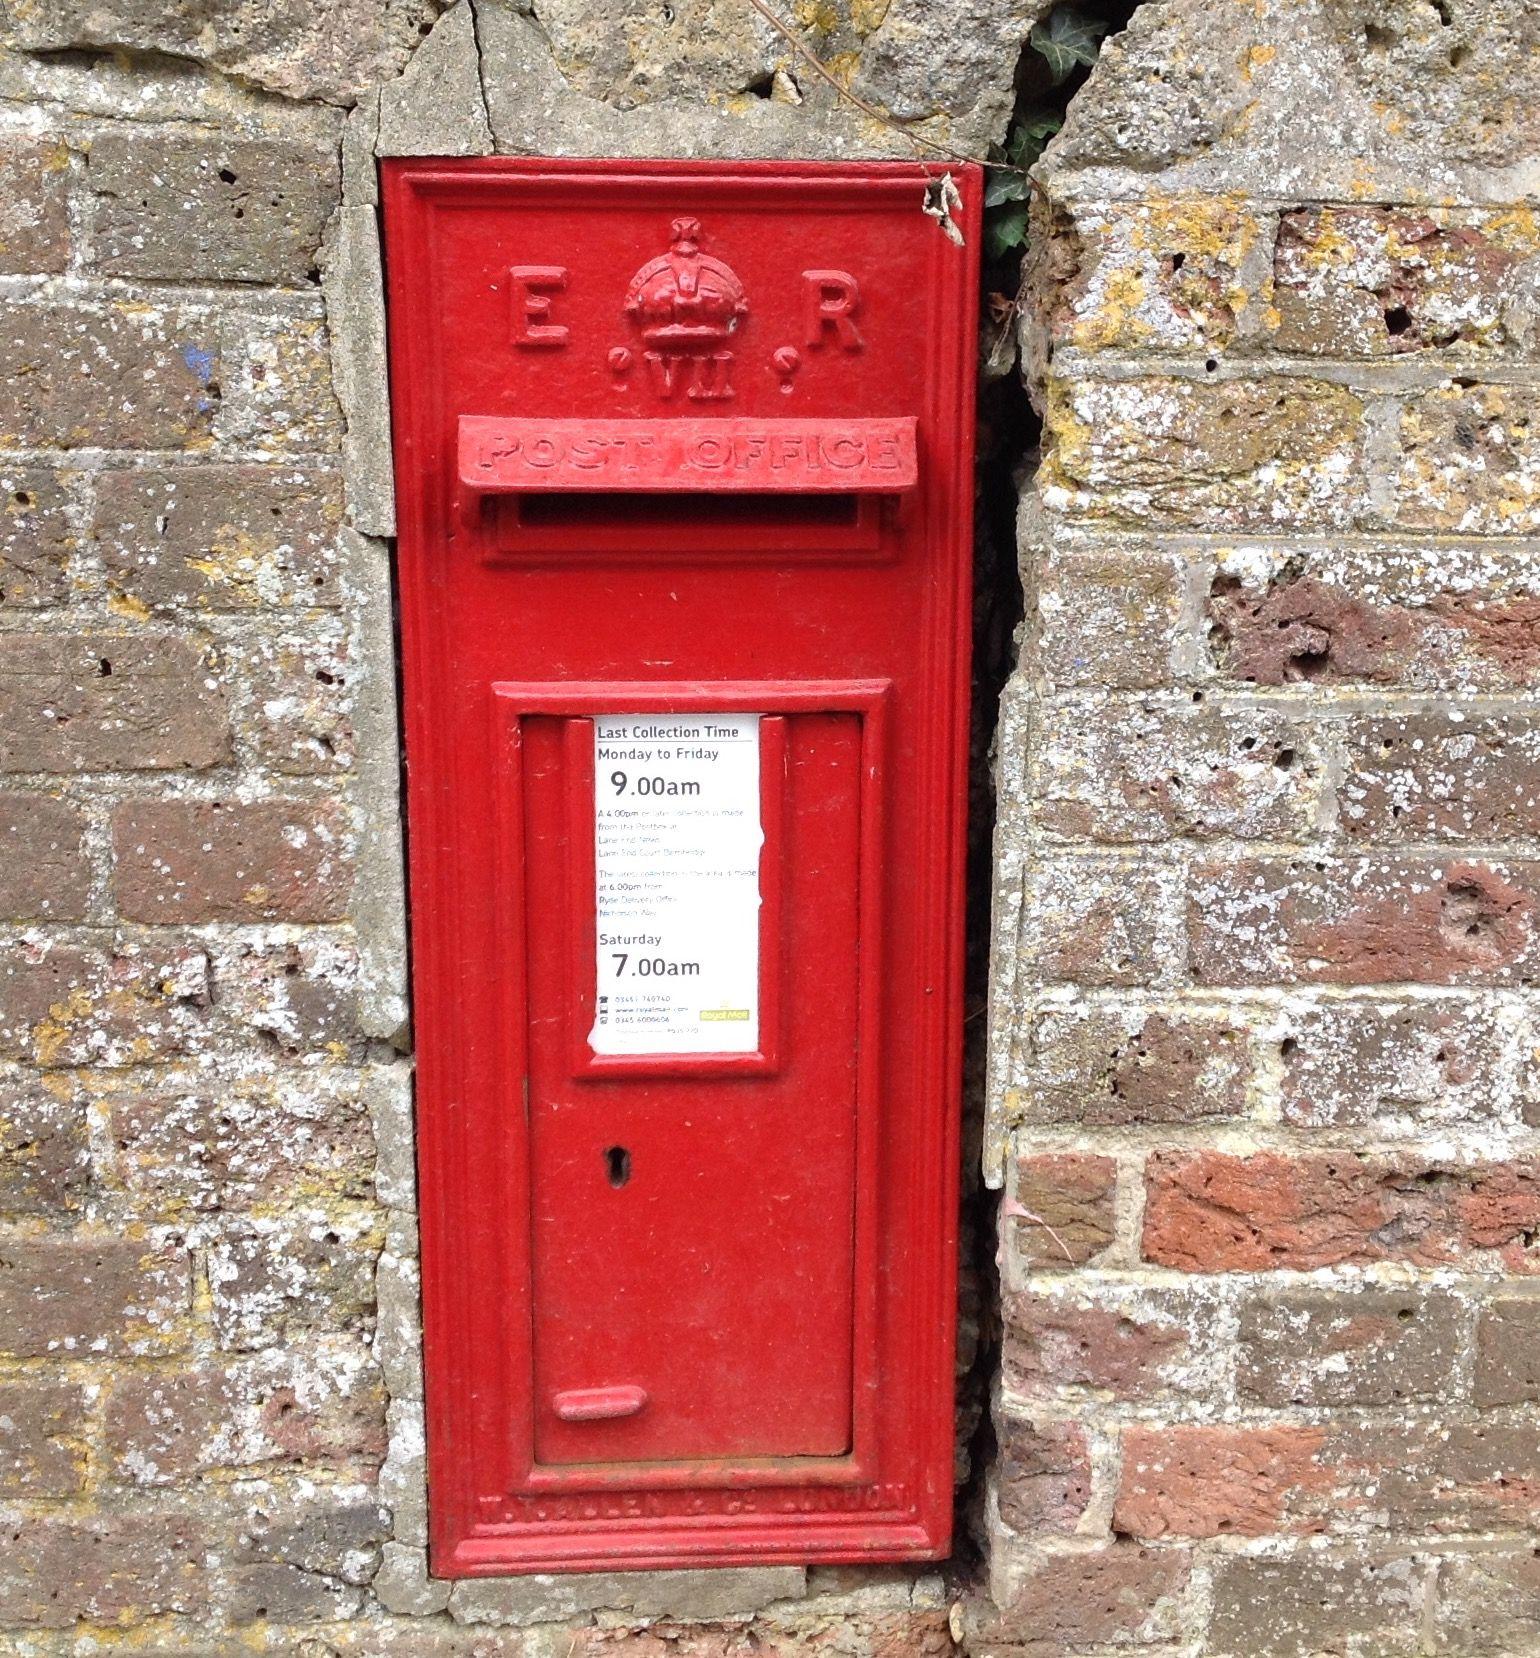 Edward Vii Post Box Bembridge Iow 13 9 15 Swains Road Antique Mailbox Post Box Telephone Box